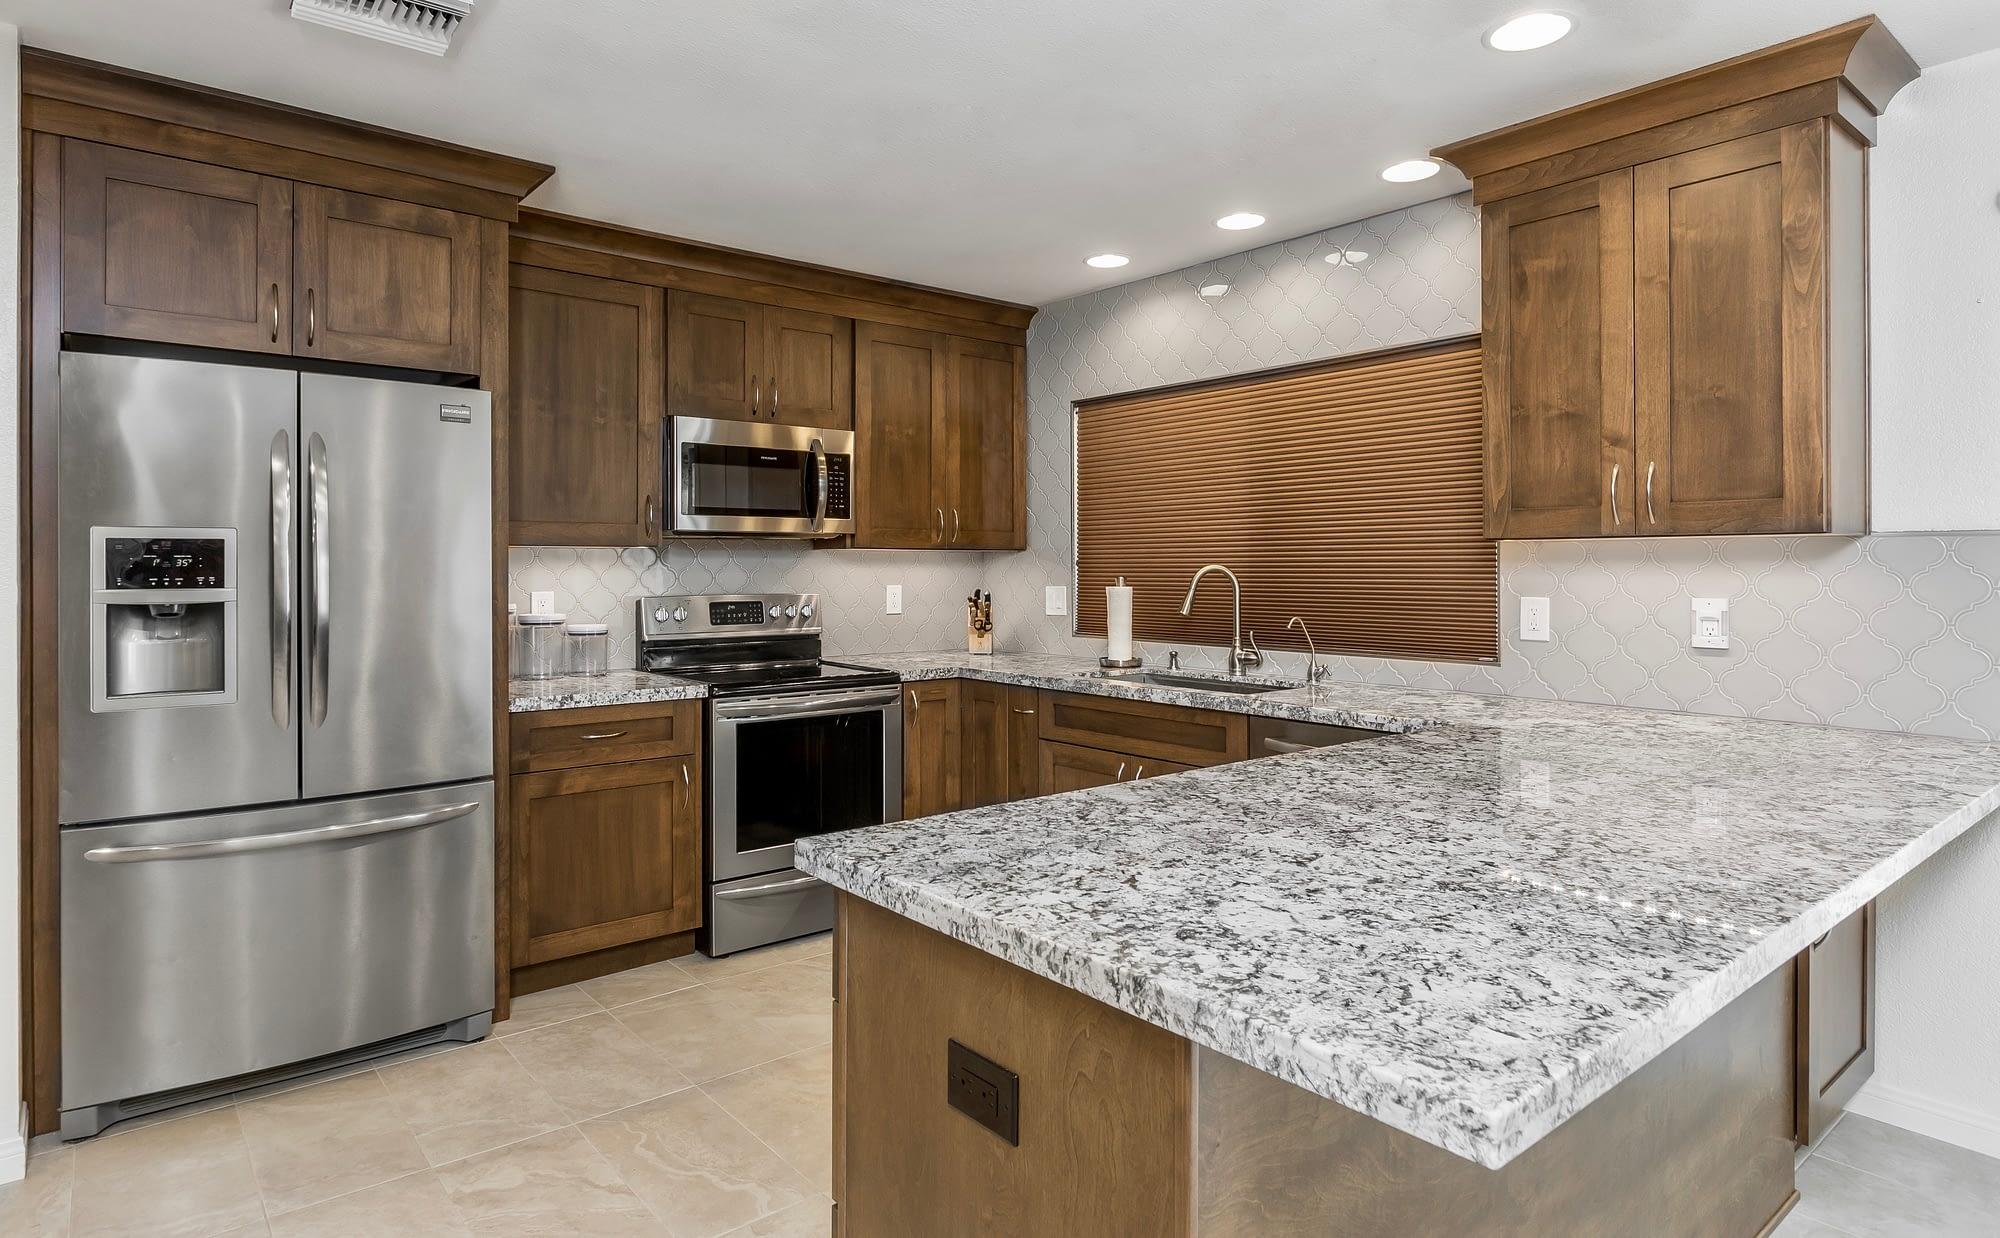 new kitchen remodel in phoenix